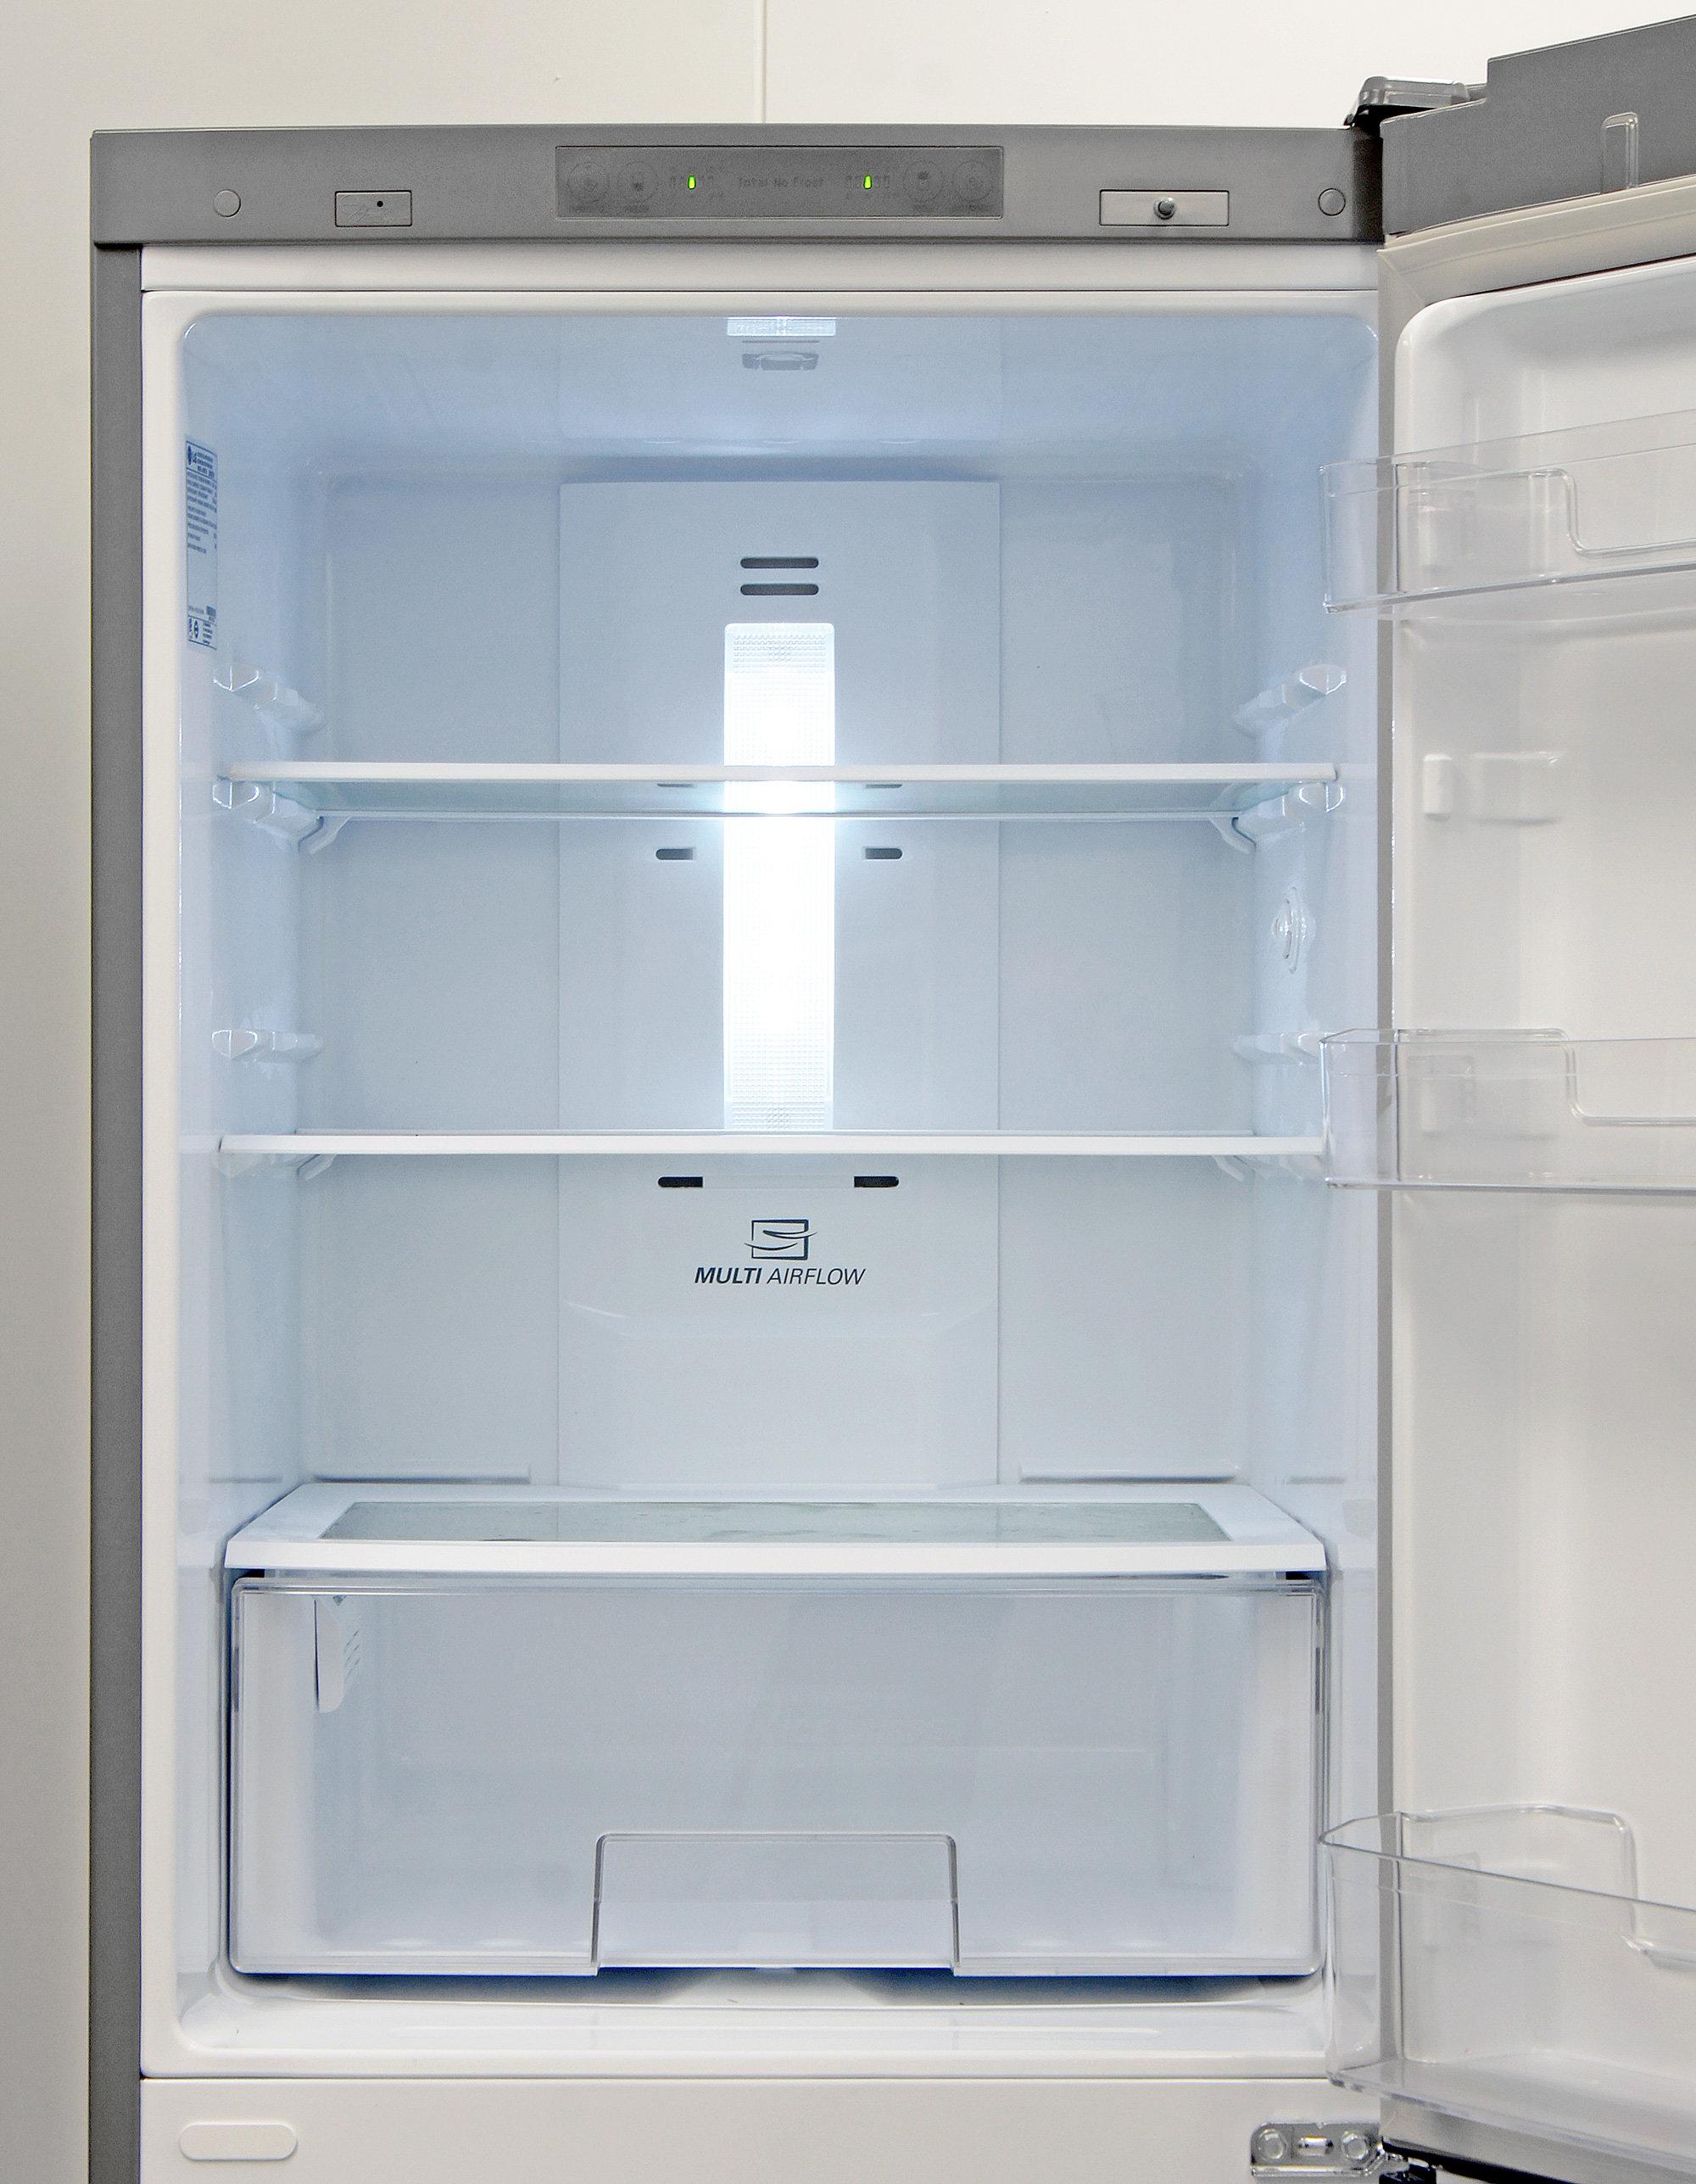 Several adjustable shelves provide varied fresh food storage in the LG LBN10551PV's fridge.